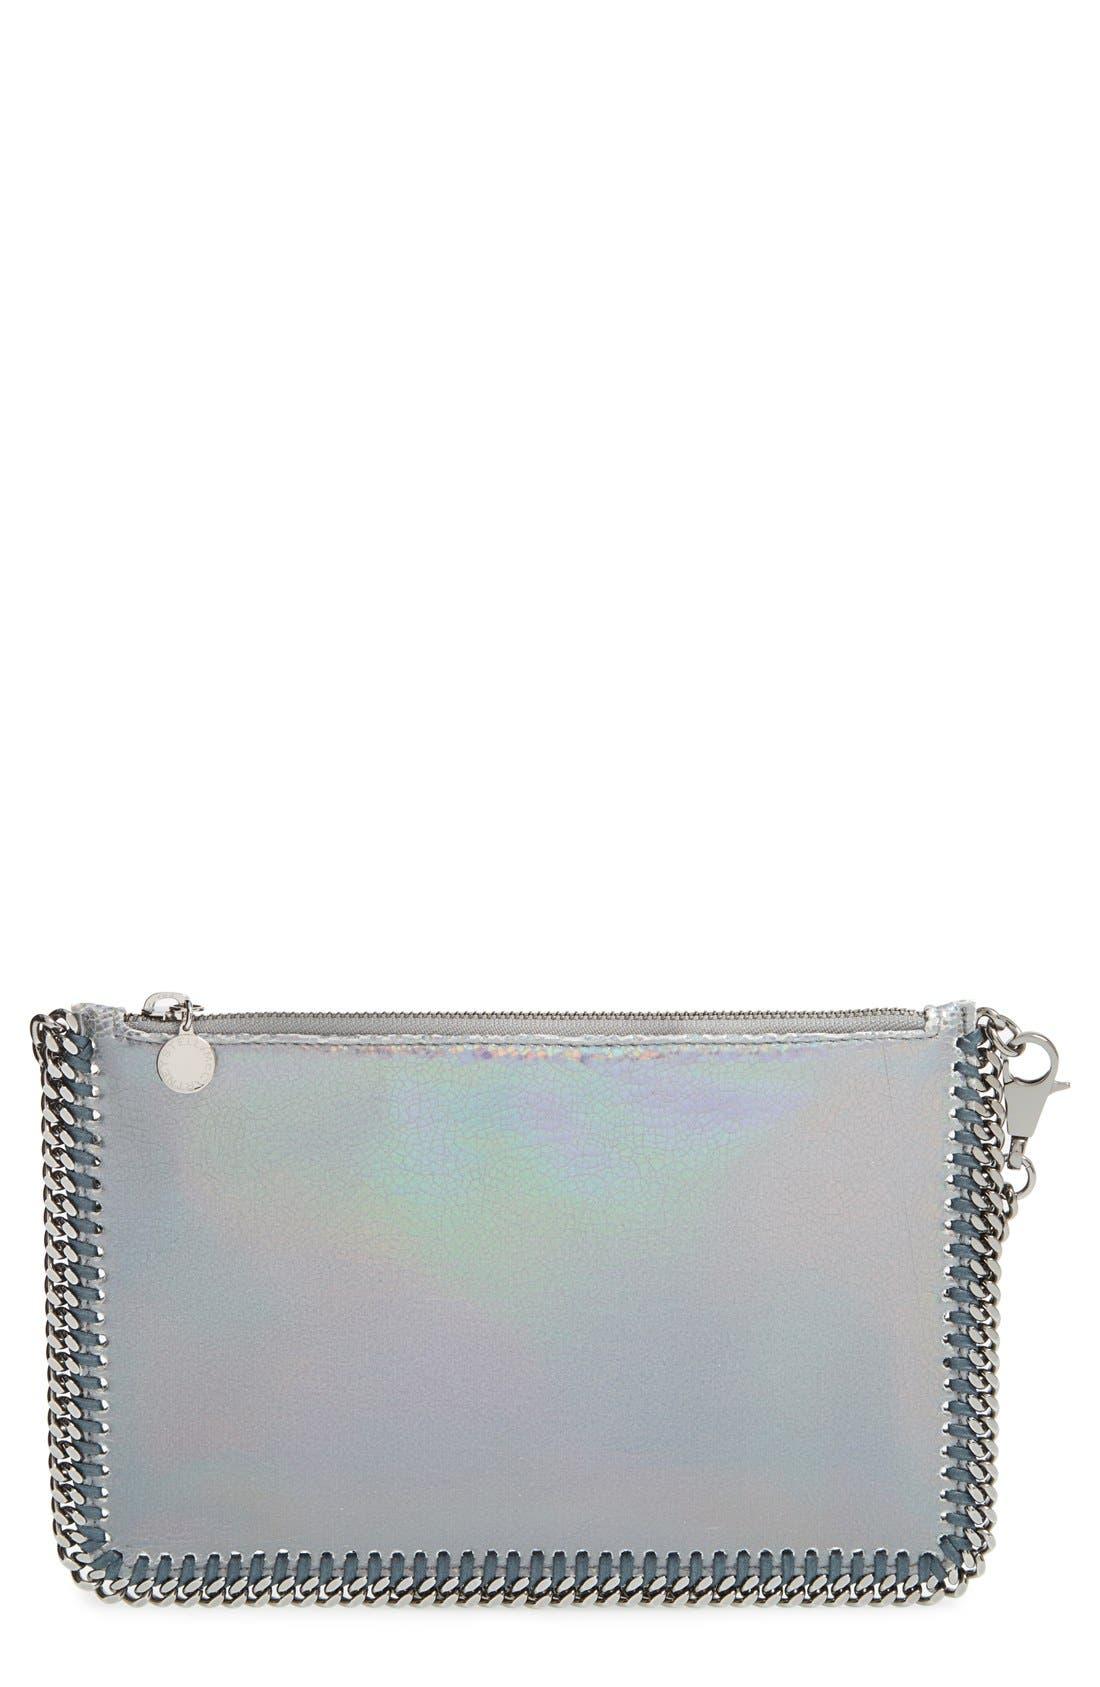 Alternate Image 1 Selected - Stella McCartney 'Falabella' Hologram Handbag